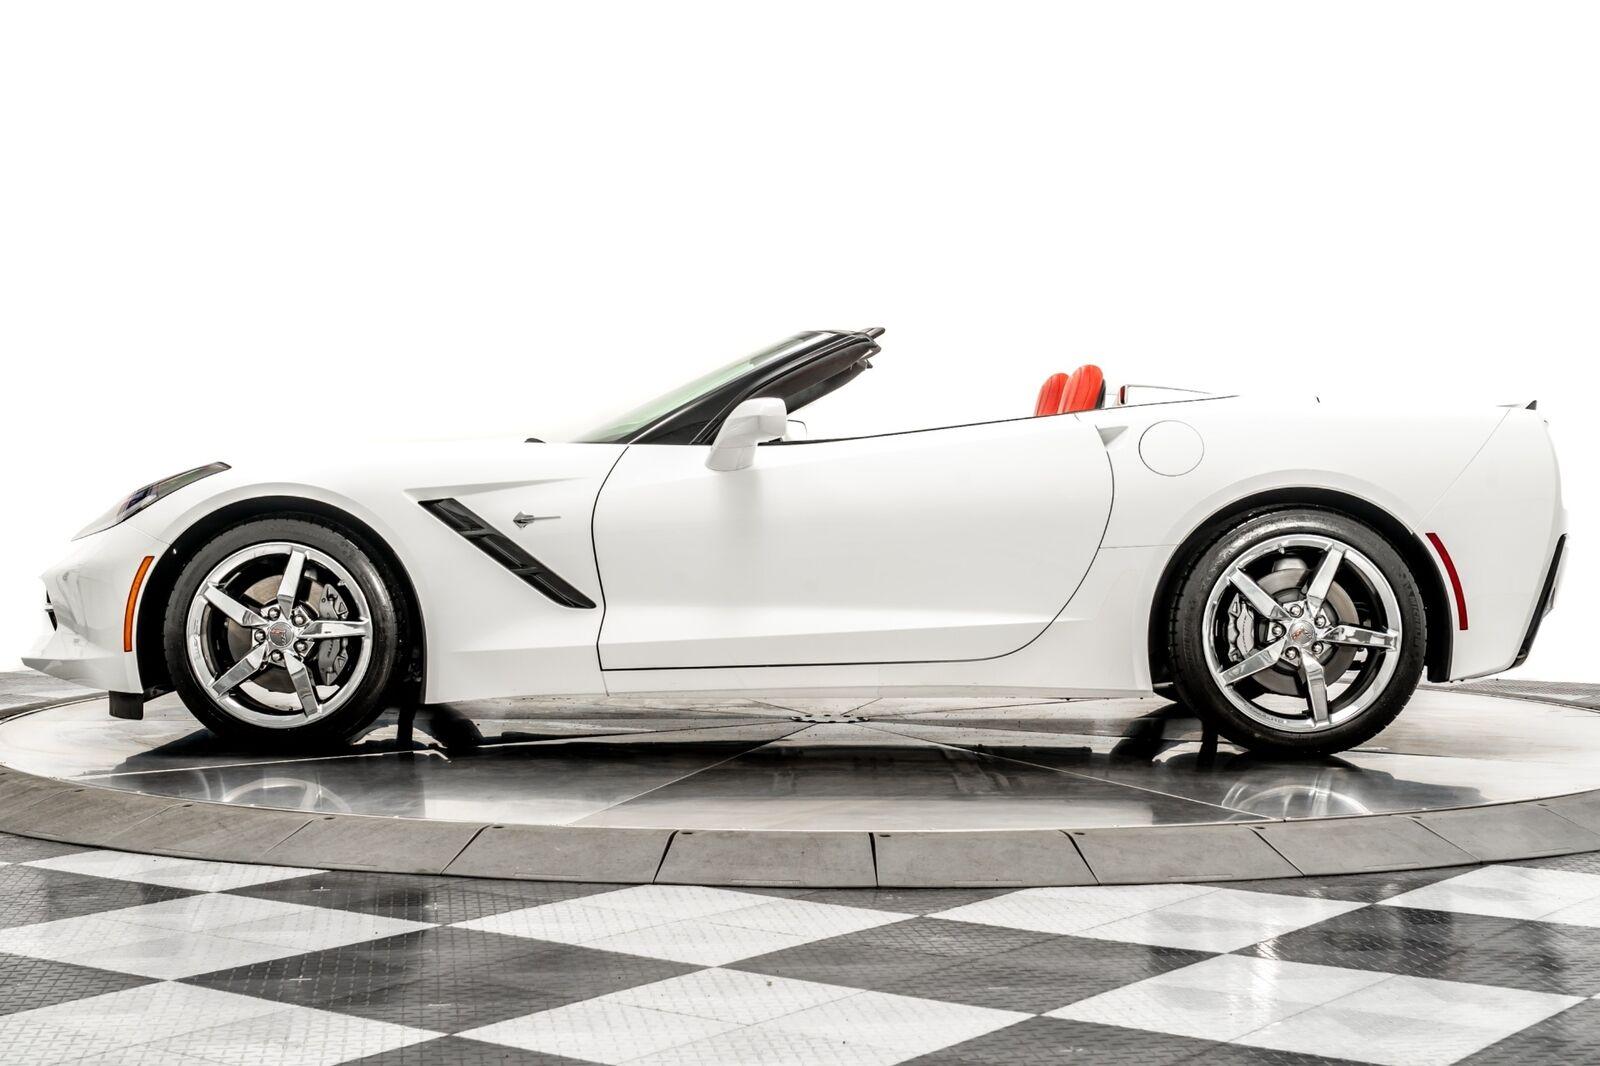 2015 White Chevrolet Corvette Convertible 3LT   C7 Corvette Photo 5